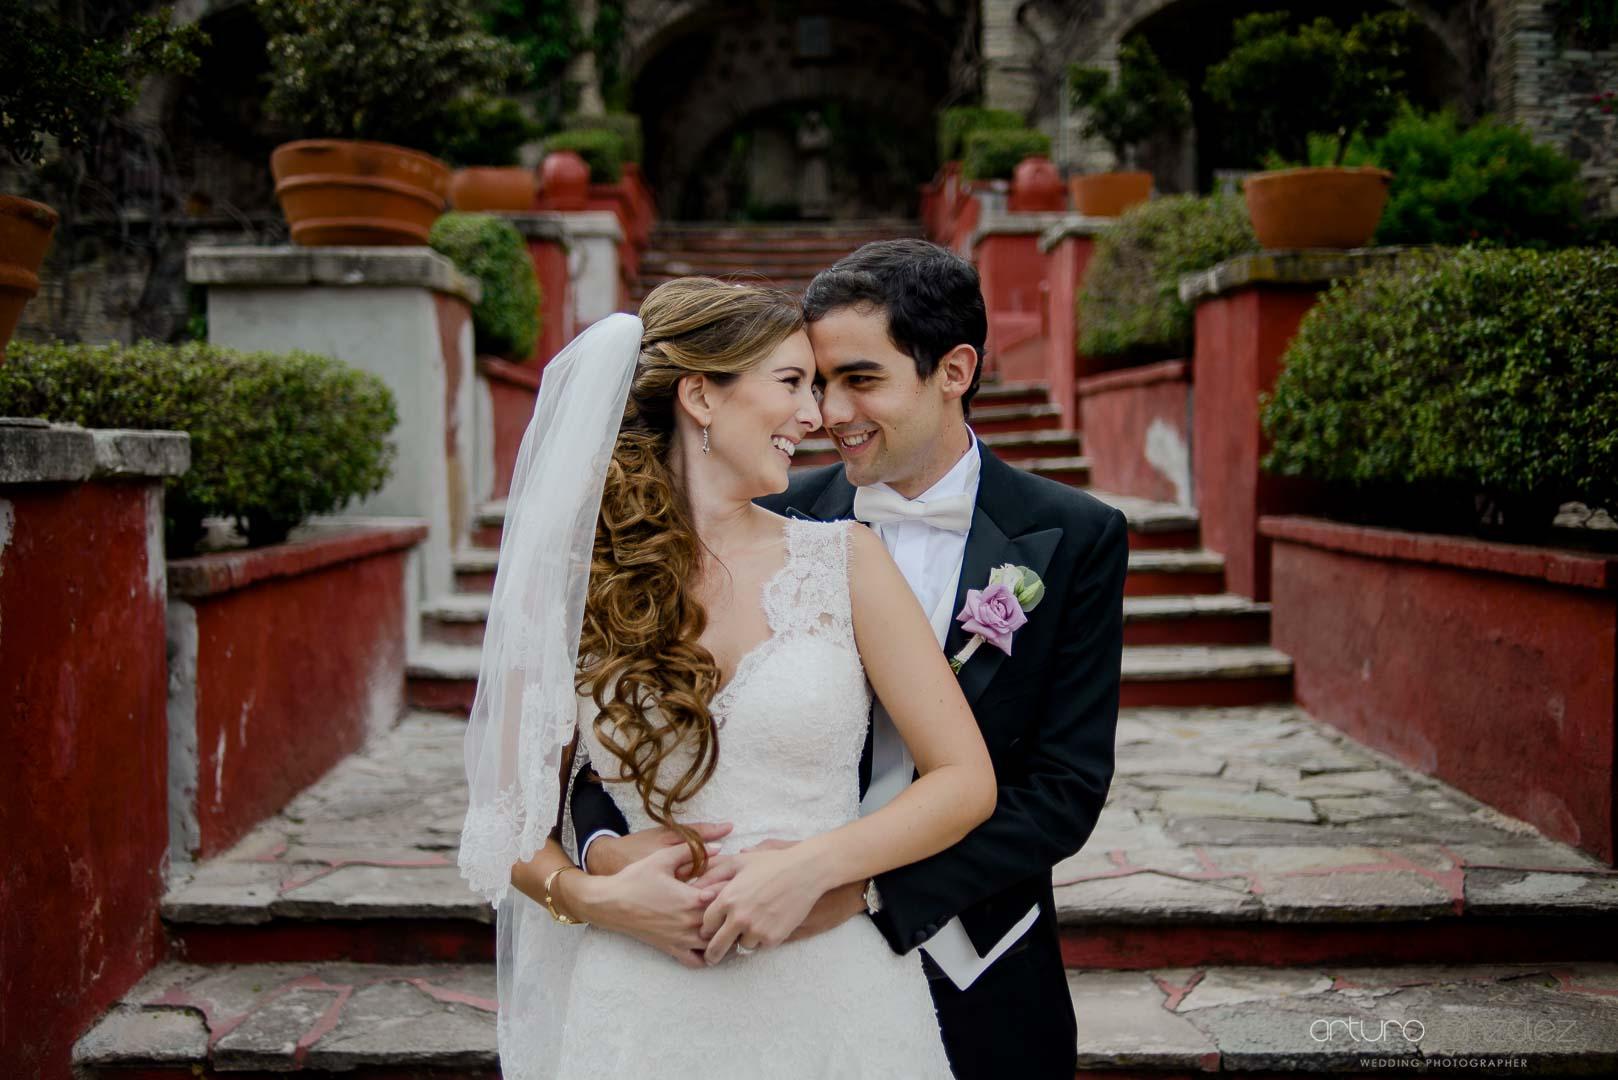 fotografo-de-bodas-en-guanajuato-42